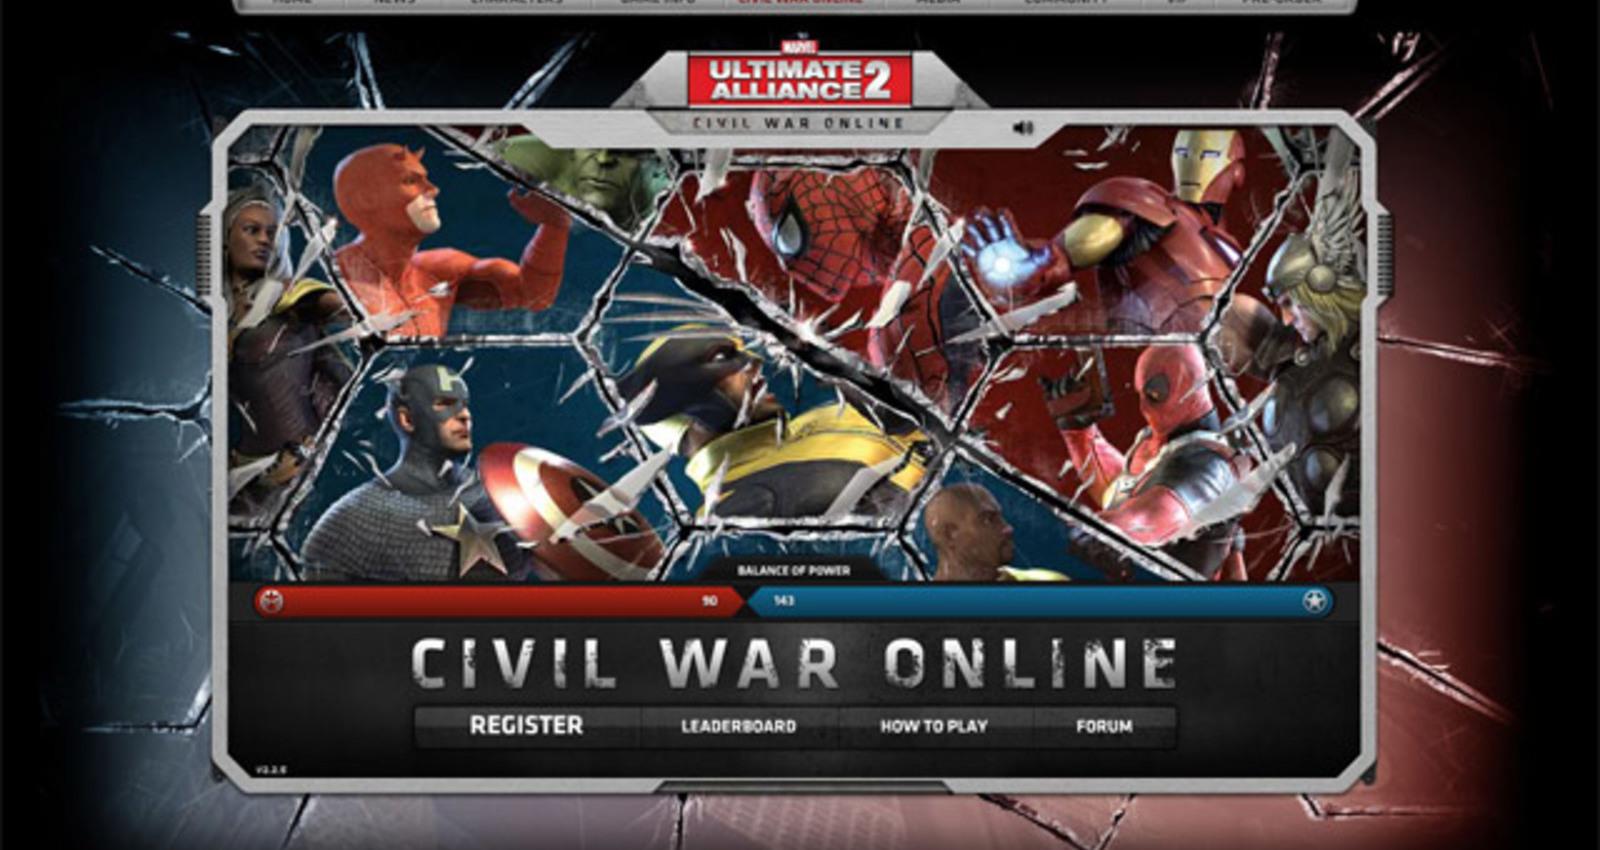 Civil War Online